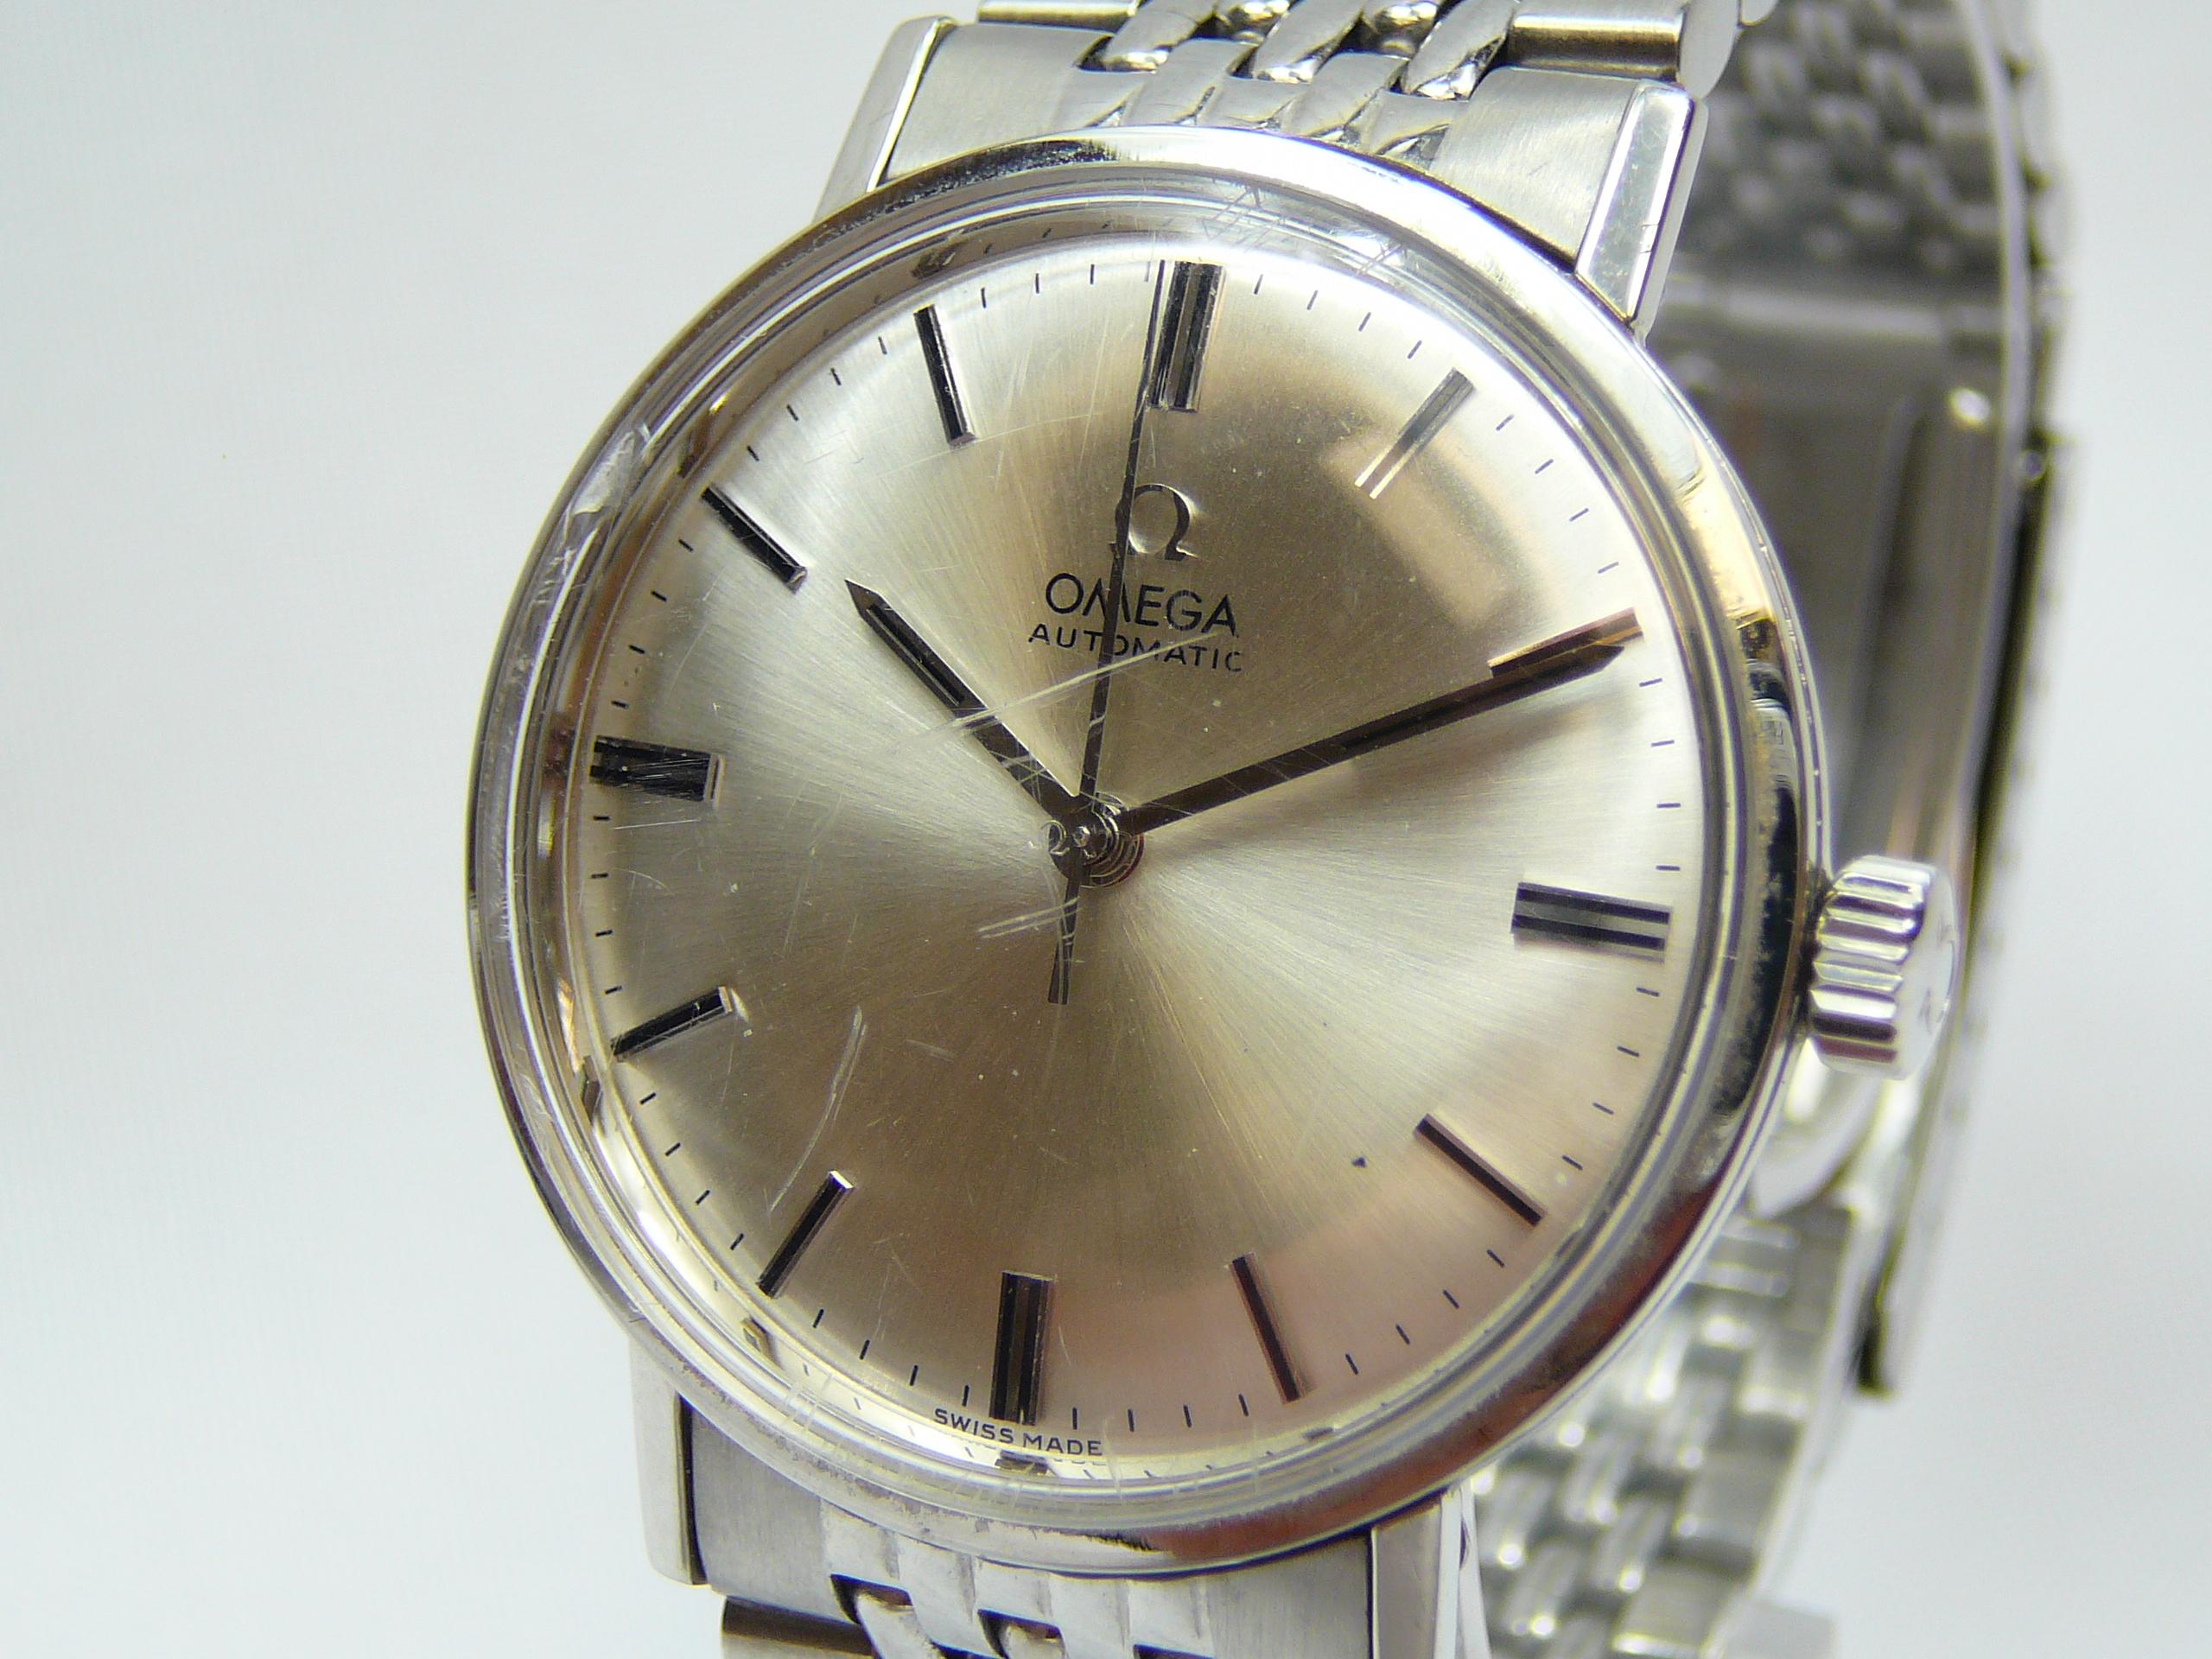 Gents Vintage Omega Wrist Watch - Image 2 of 4